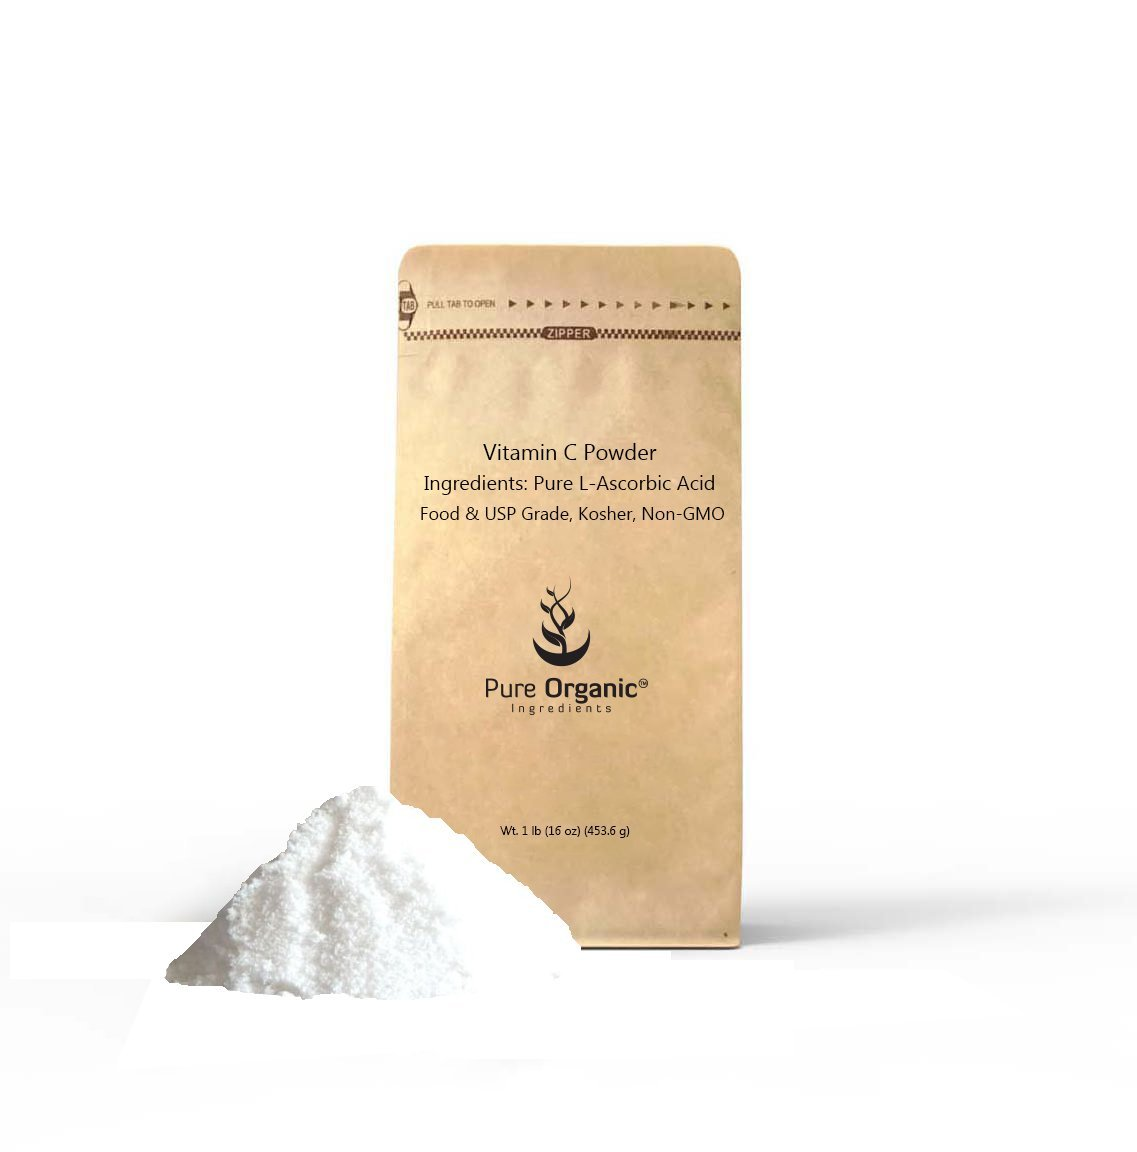 Vitamin C Powder 1 lb (16 oz) L-Ascorbic Acid, Antioxidant, Boost Immune System, DIY Skin Care, Eco-Friendly Packaging (Also Available in 4 oz, 2 lb, 5 lb)